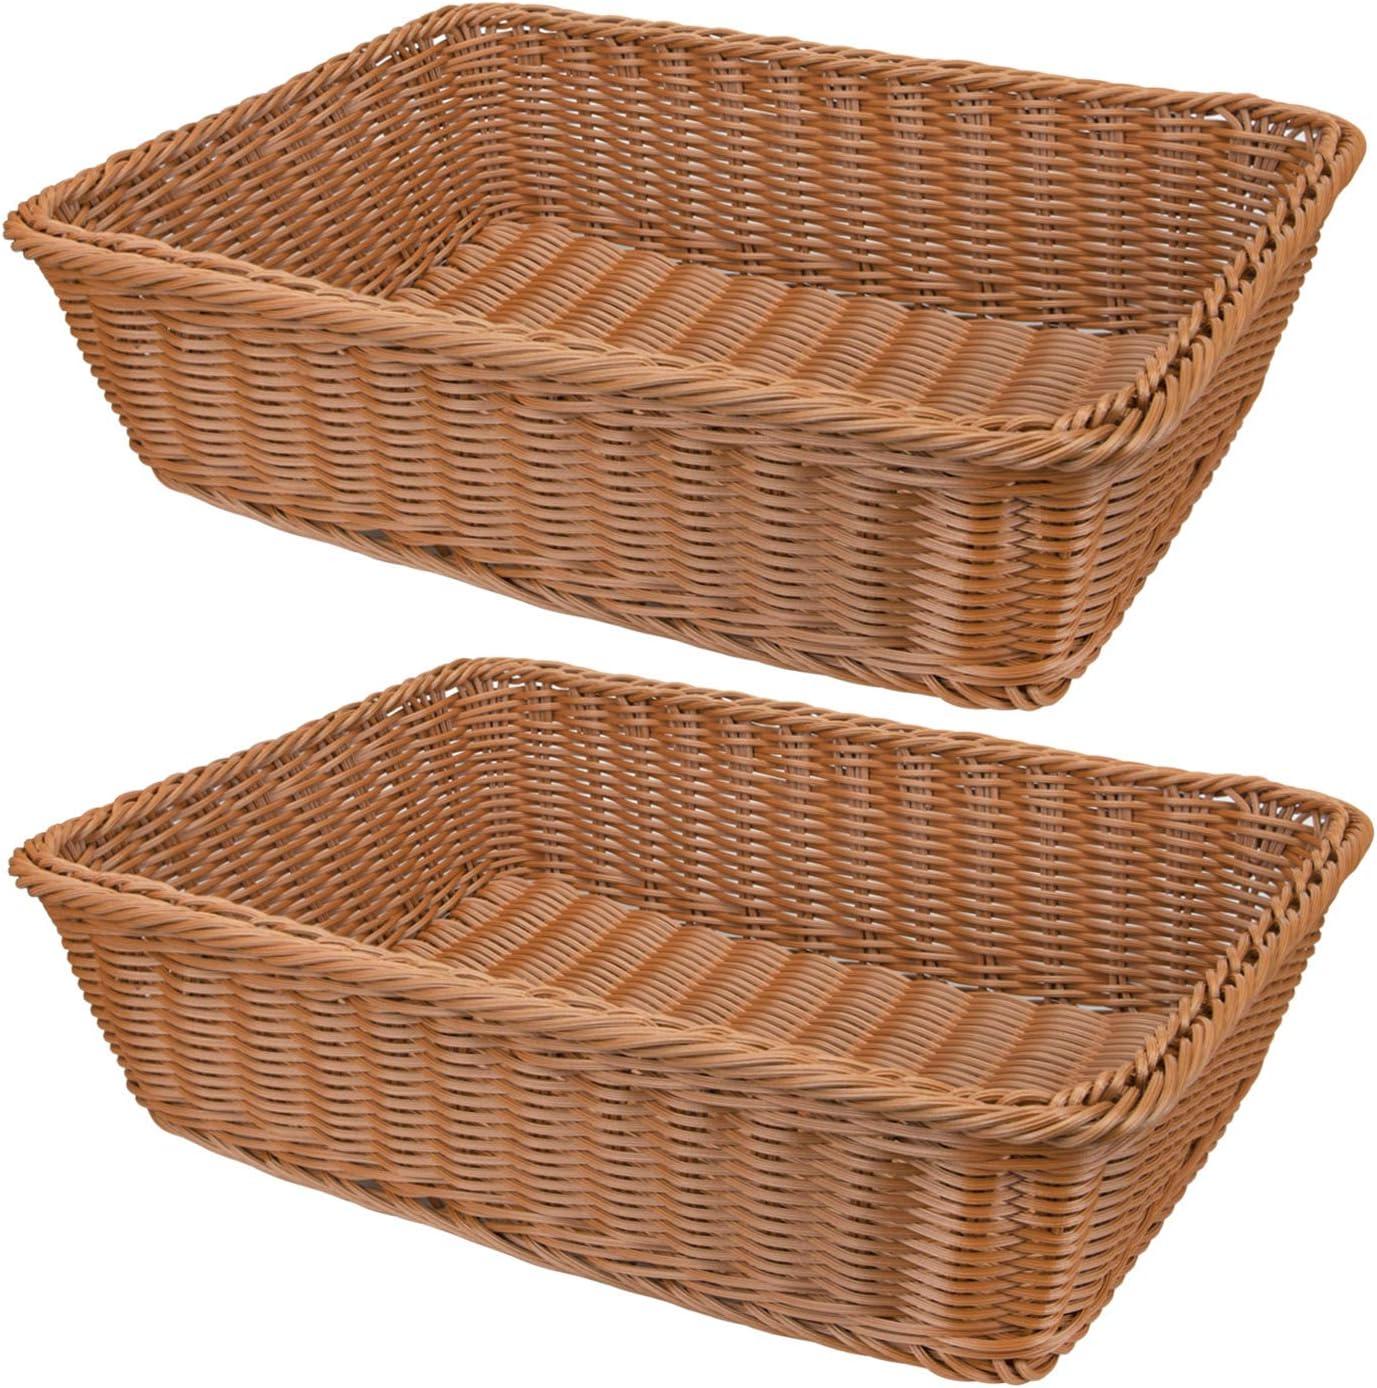 Yarlung 2 Pack Imitation Rattan Woven Bread Basket, 15.7 Inch Poly-Wicker Food Serving Basket for Fruit, Vegetables, Home Kitchen, Restaurant, Outdoor, Brown Rectangular